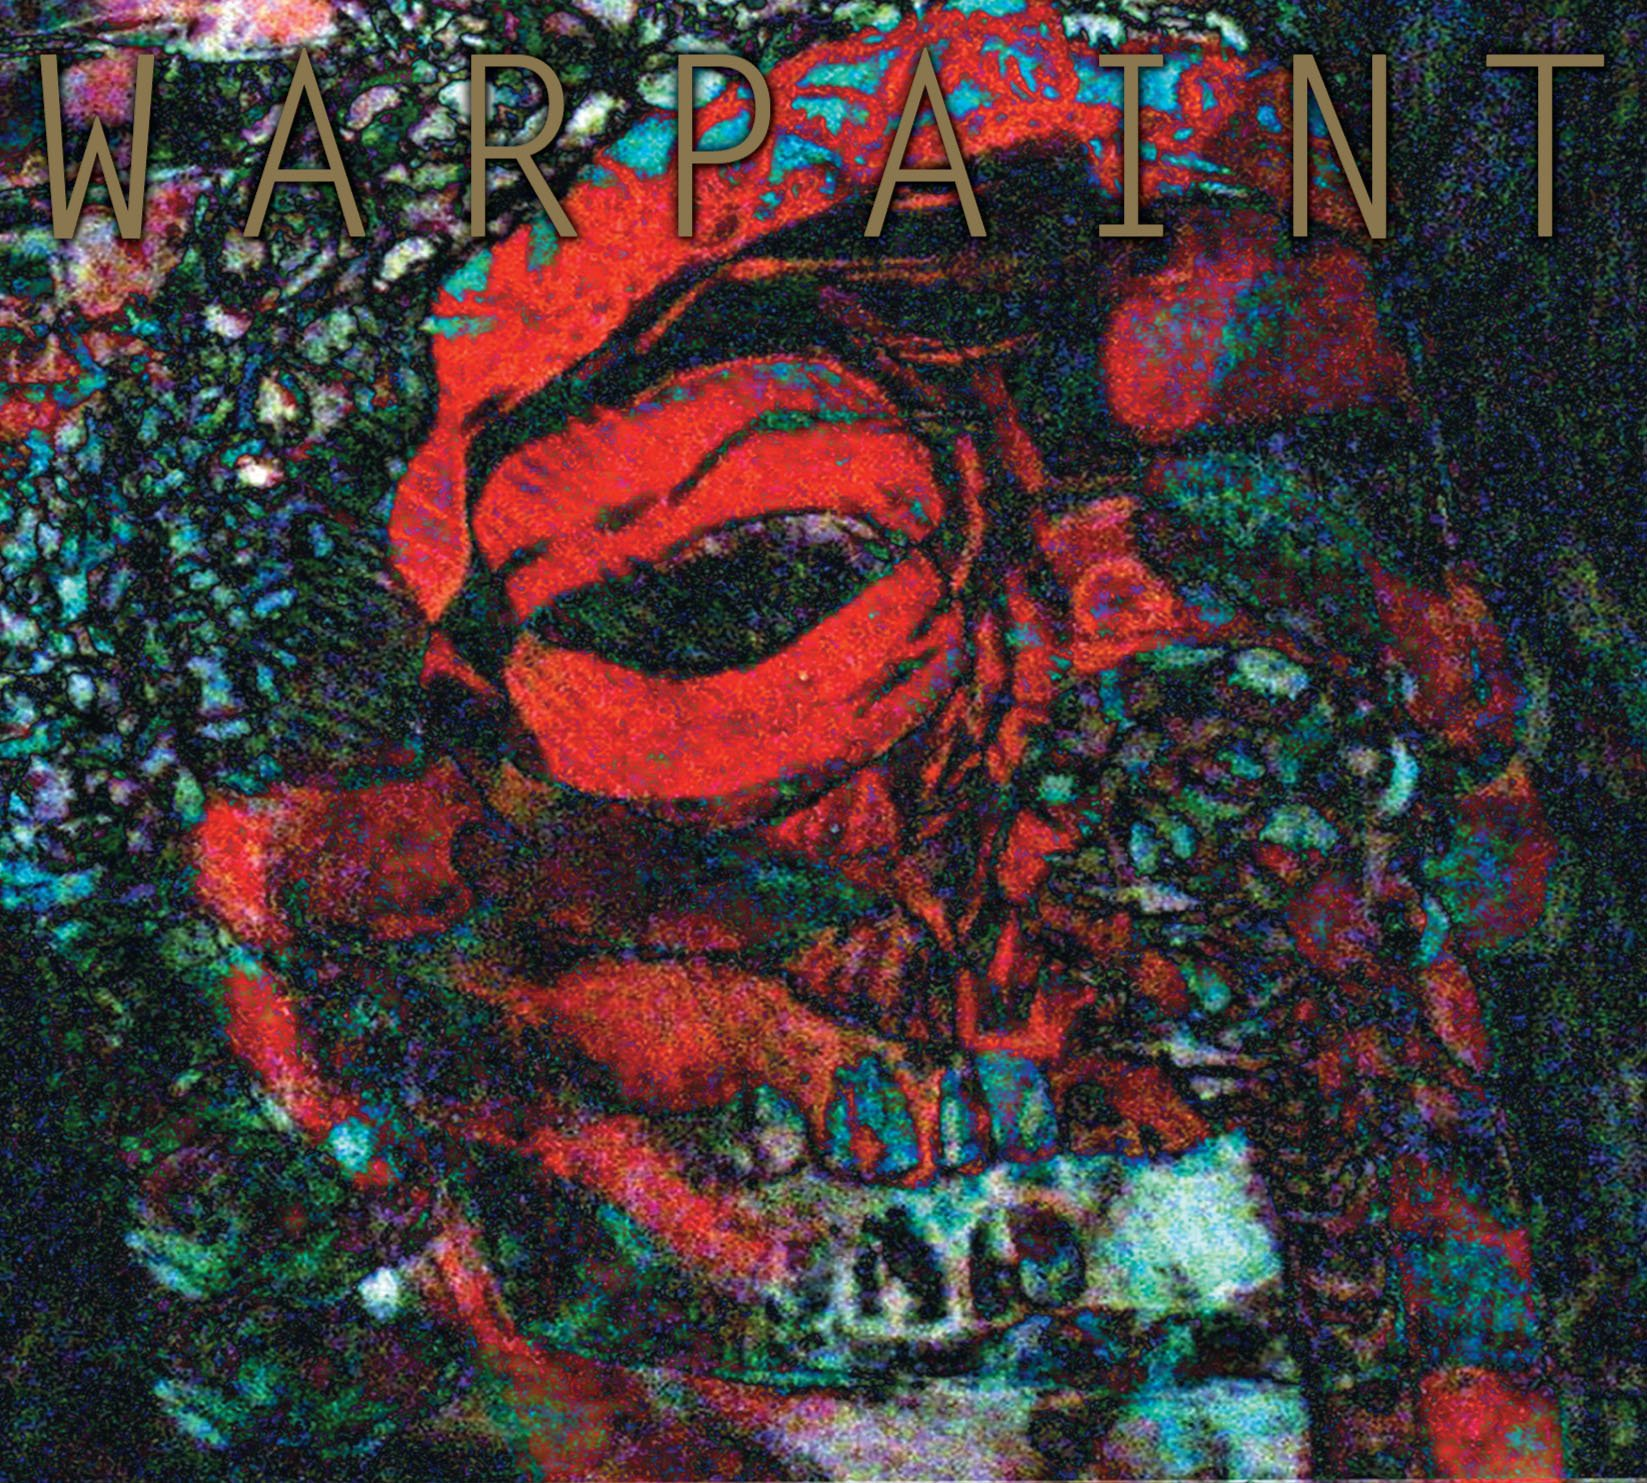 CD : Warpaint - The Fool (CD)